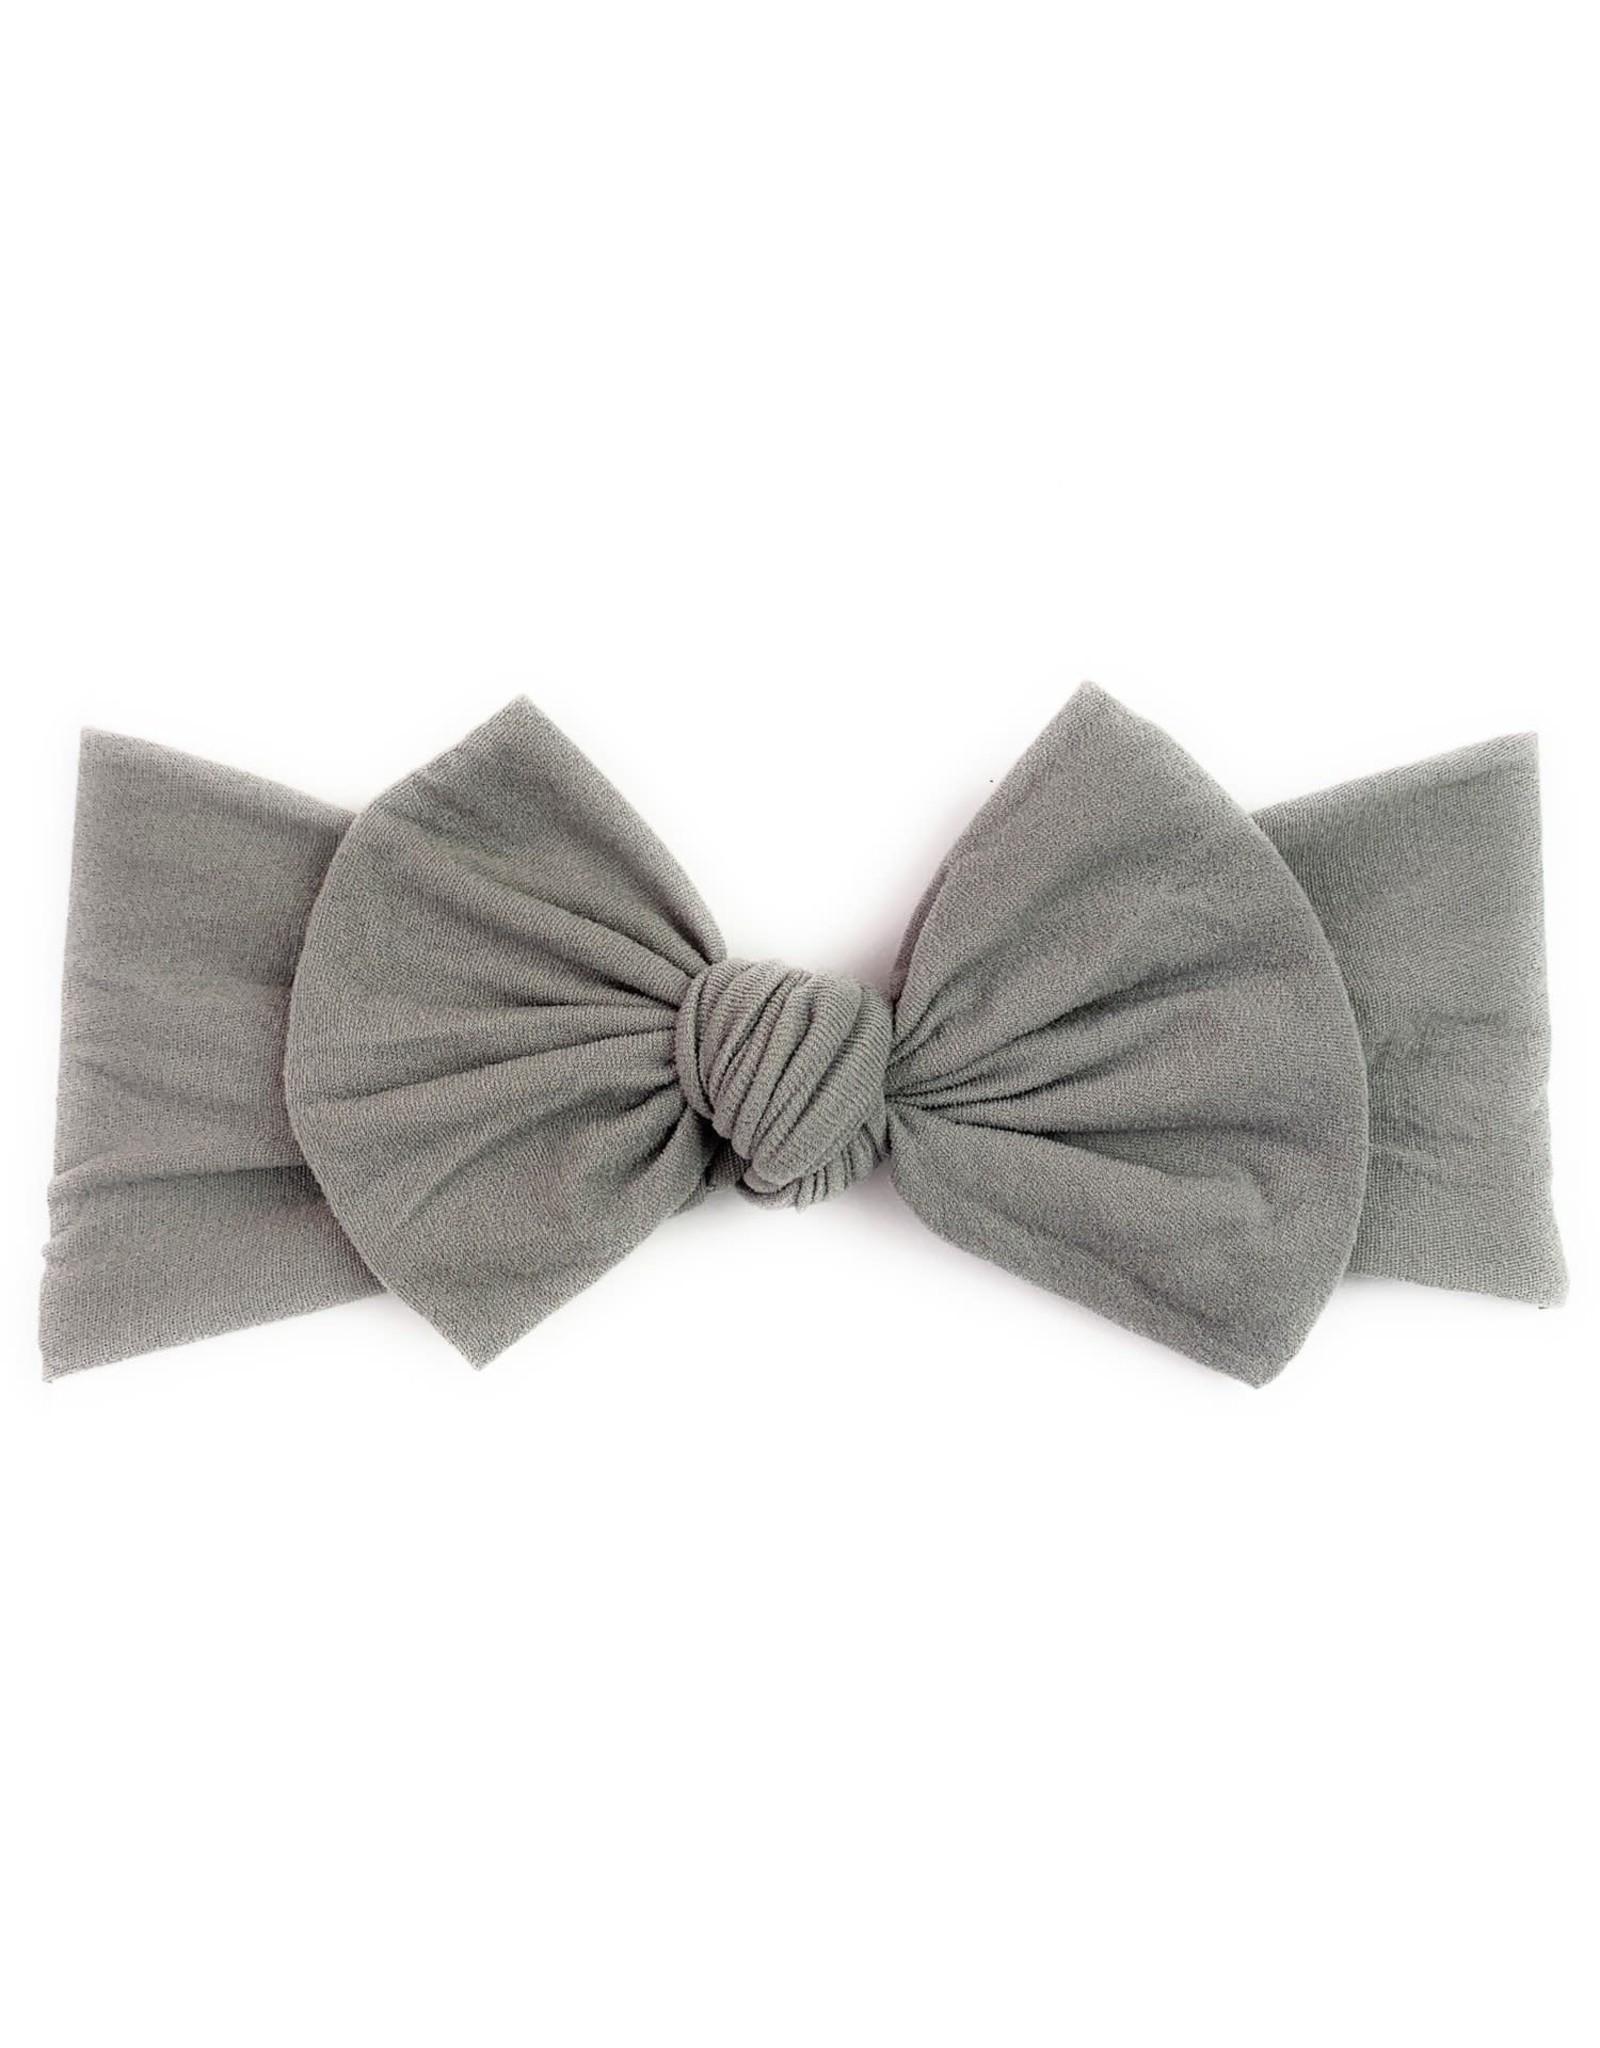 Baby Wisp Baby Wisp Bow Headband, Grey